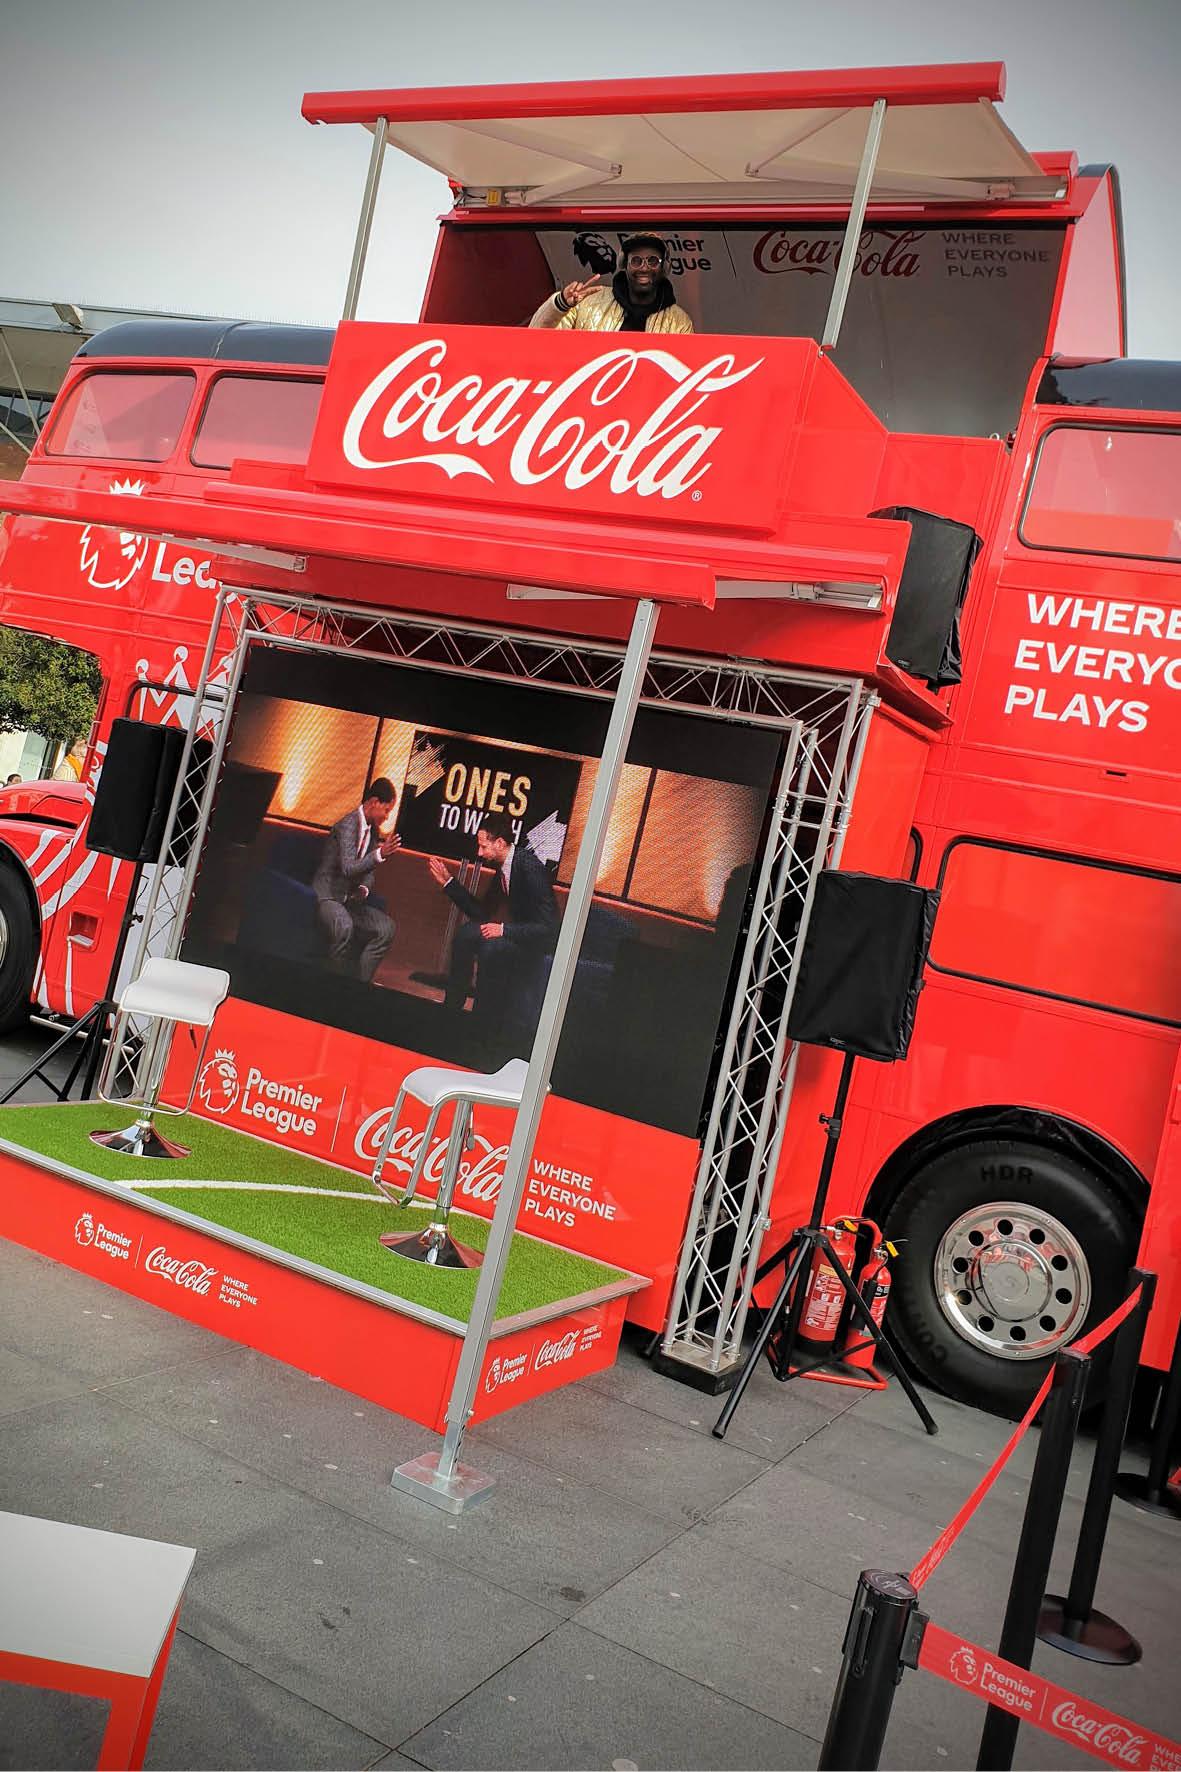 bus_business_2019p_coca_cola_6.jpg